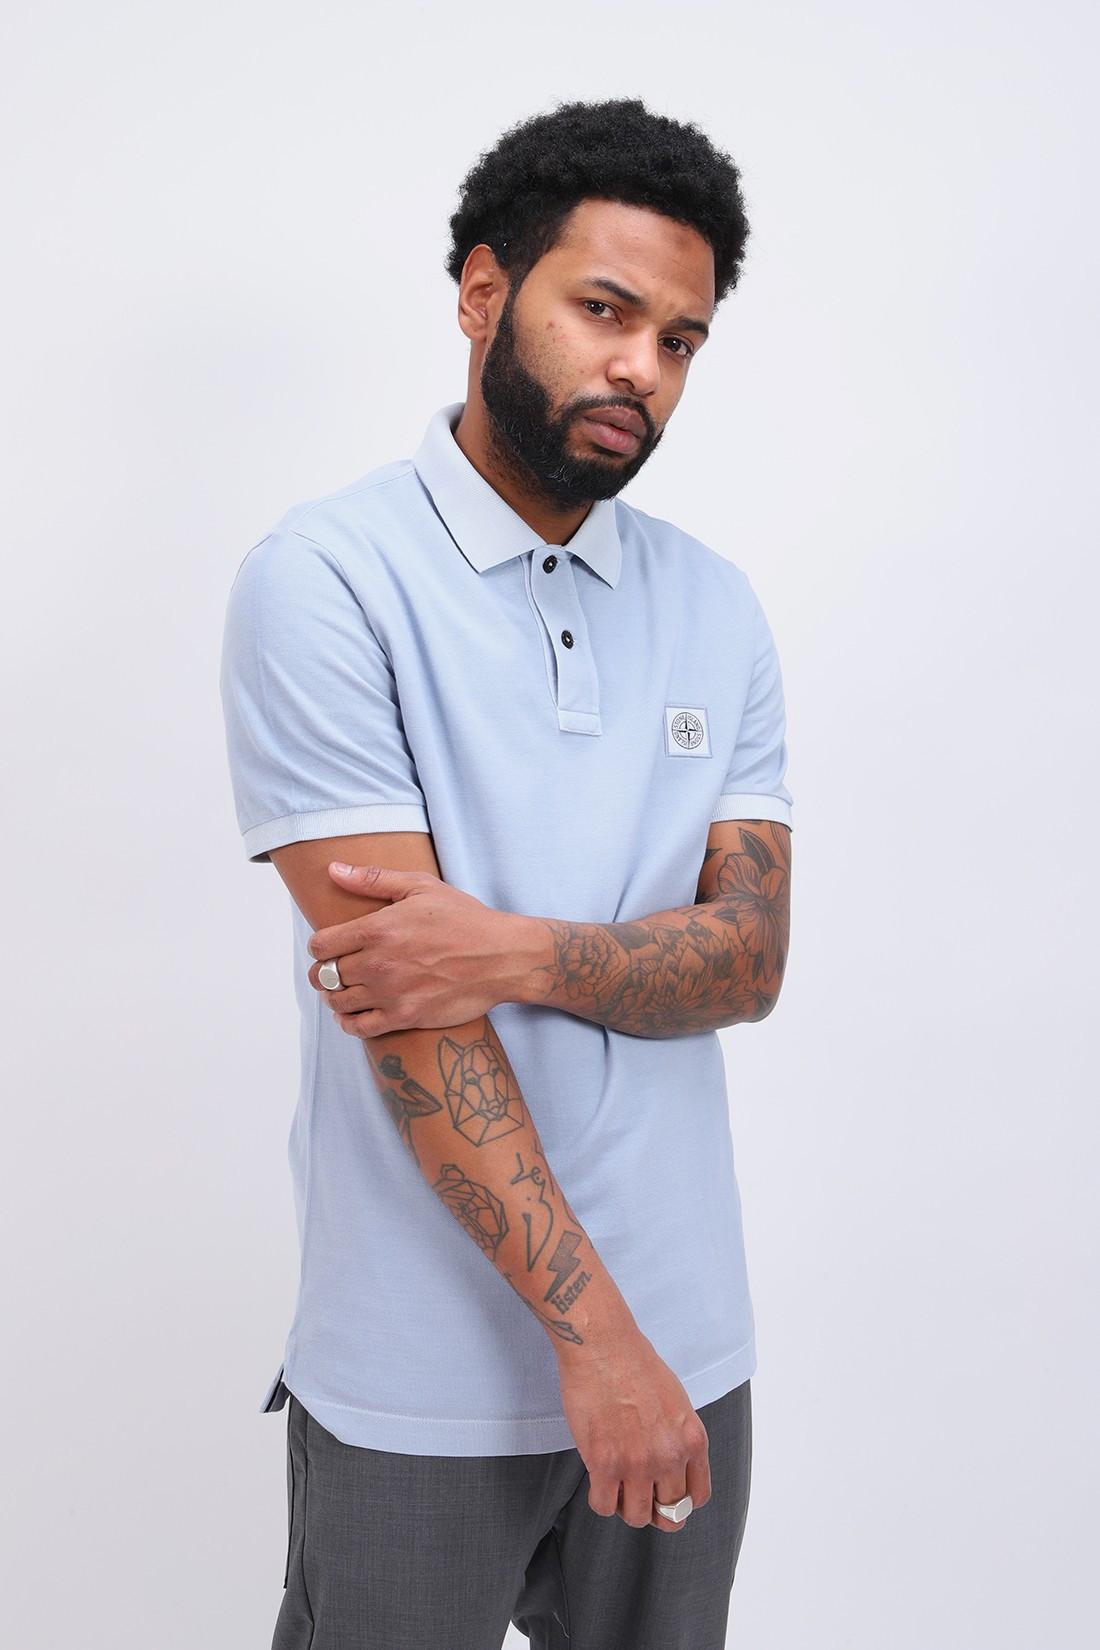 STONE ISLAND / 22s67 polo shirt v0041 Cielo